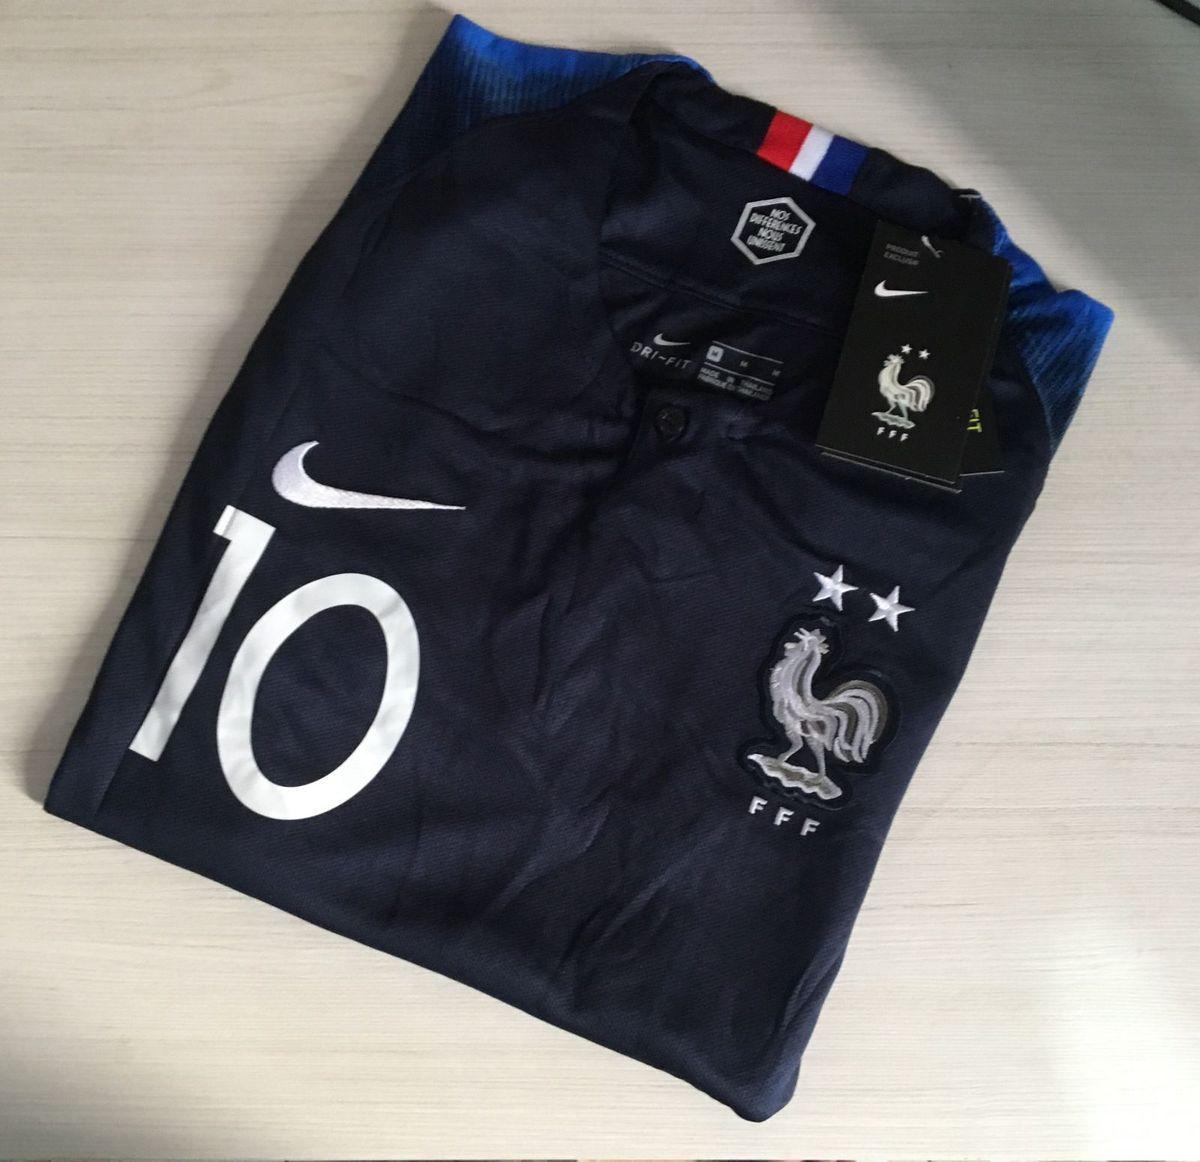 camisa frança home 2018 - camisetas nike.  Czm6ly9wag90b3muzw5qb2vplmnvbs5ici9wcm9kdwn0cy82ody4otq2l2e0mmq4nmfjnjexn2vlnzq1ztm2ymrkn2zhzji5mwnmlmpwzw  ... afebc14b5cdfb